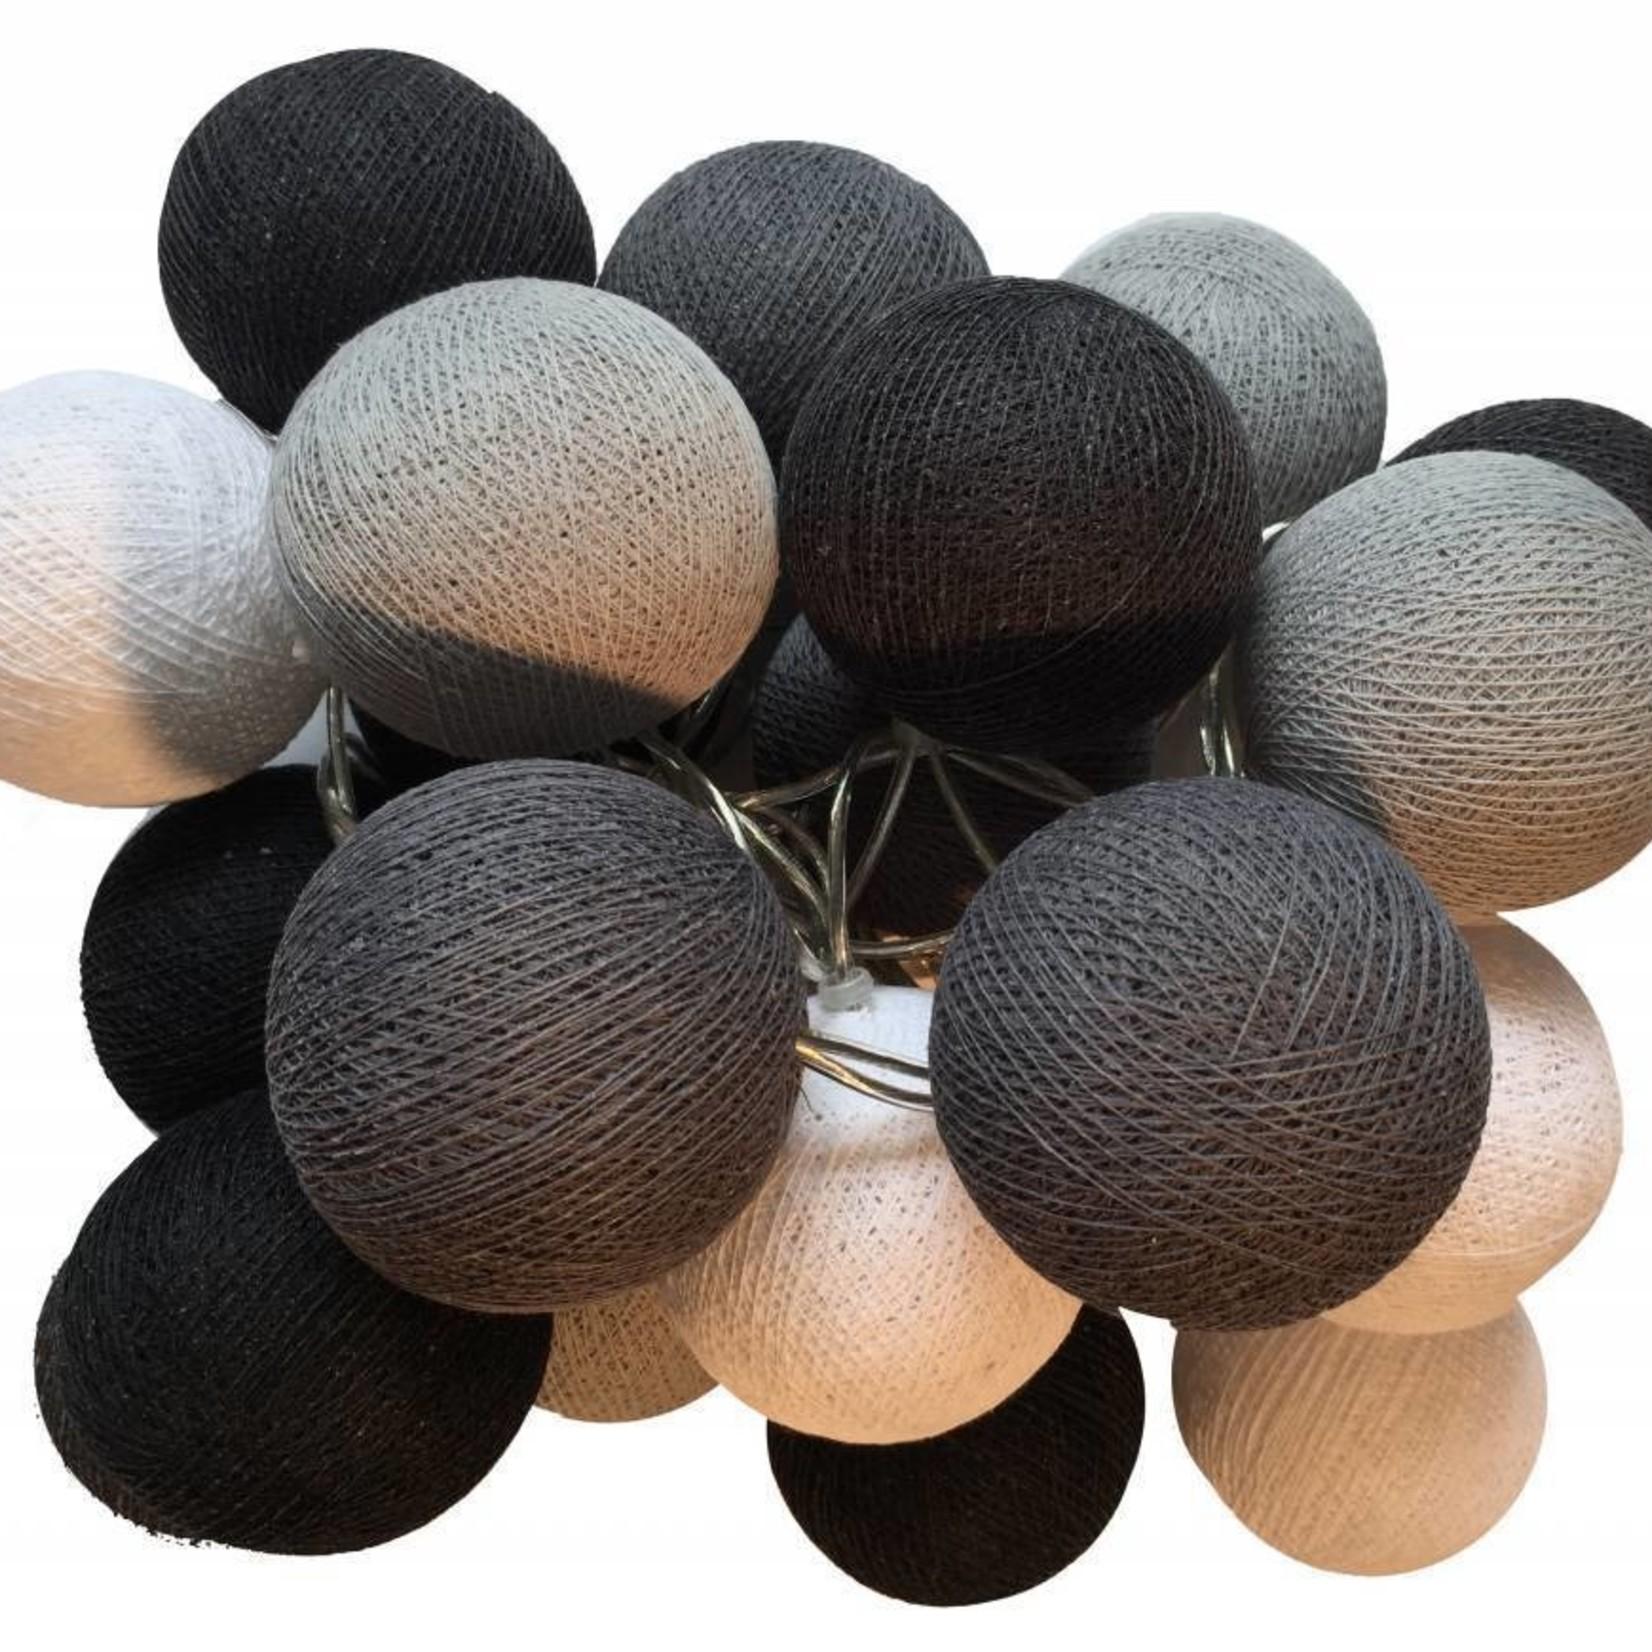 Cotton Ball Lights Cotton Ball Lights - Antra